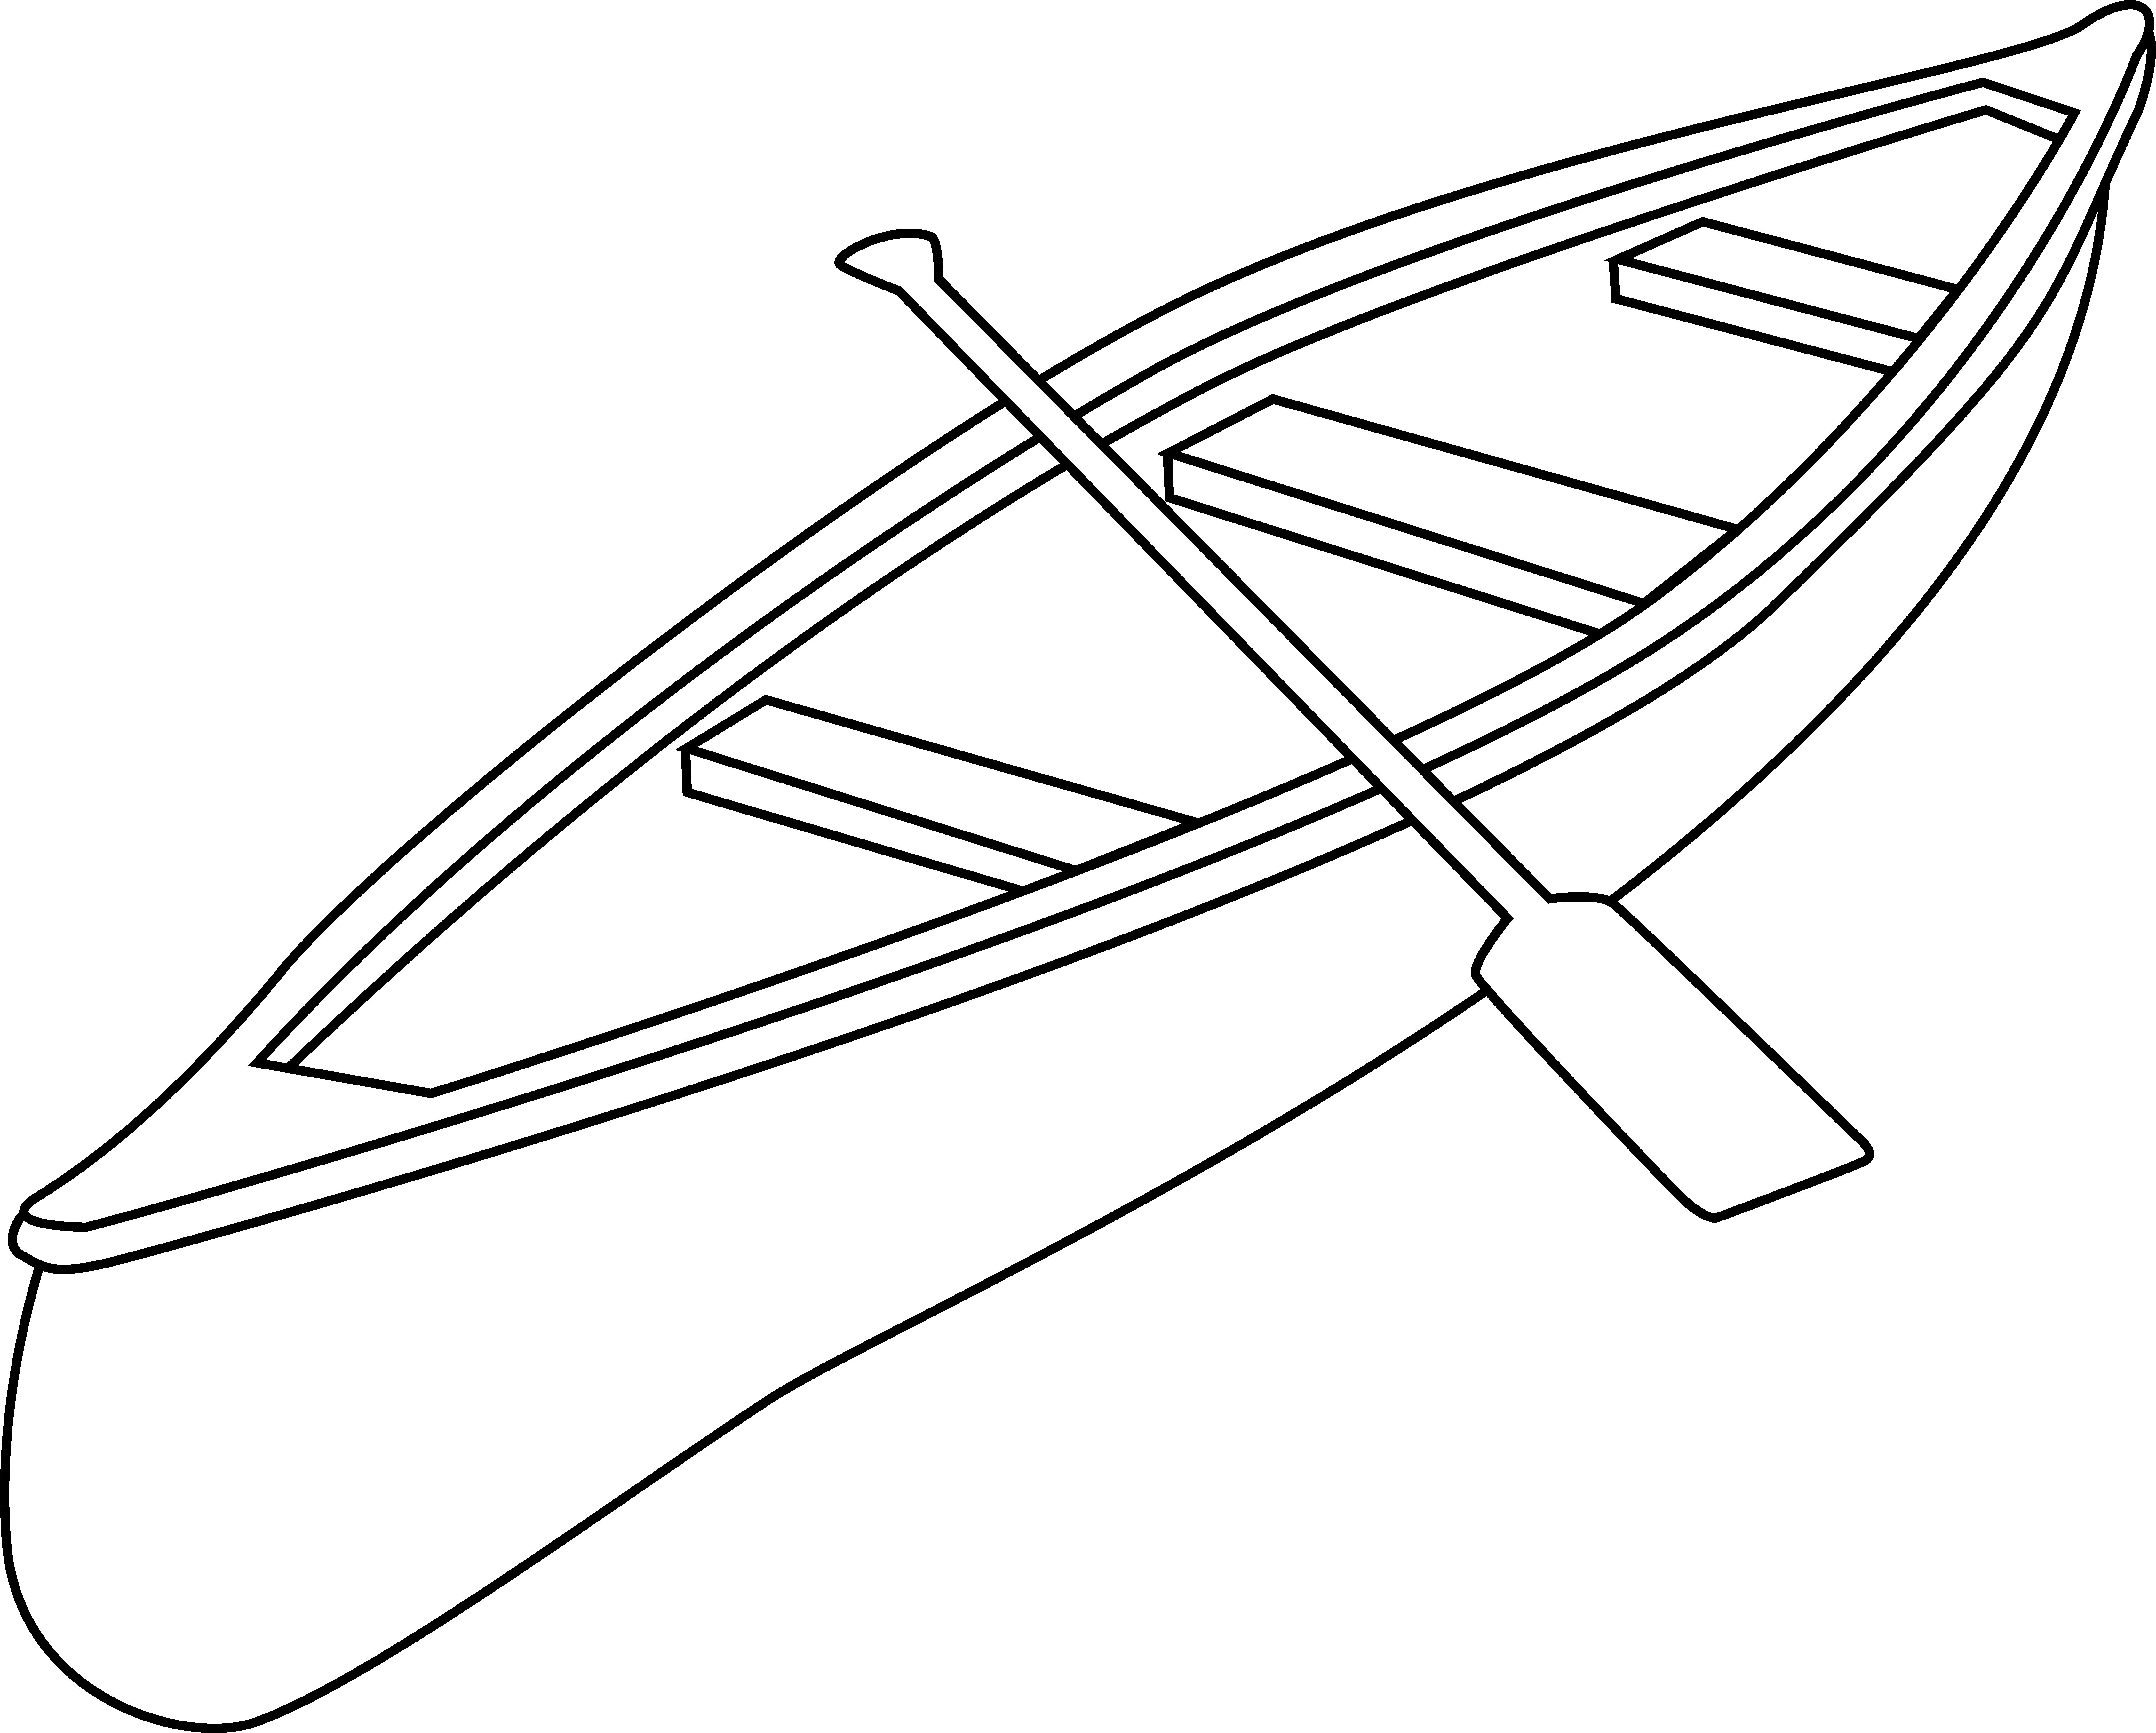 clip art freeuse Free clip art outline. Canoe clipart black and white.